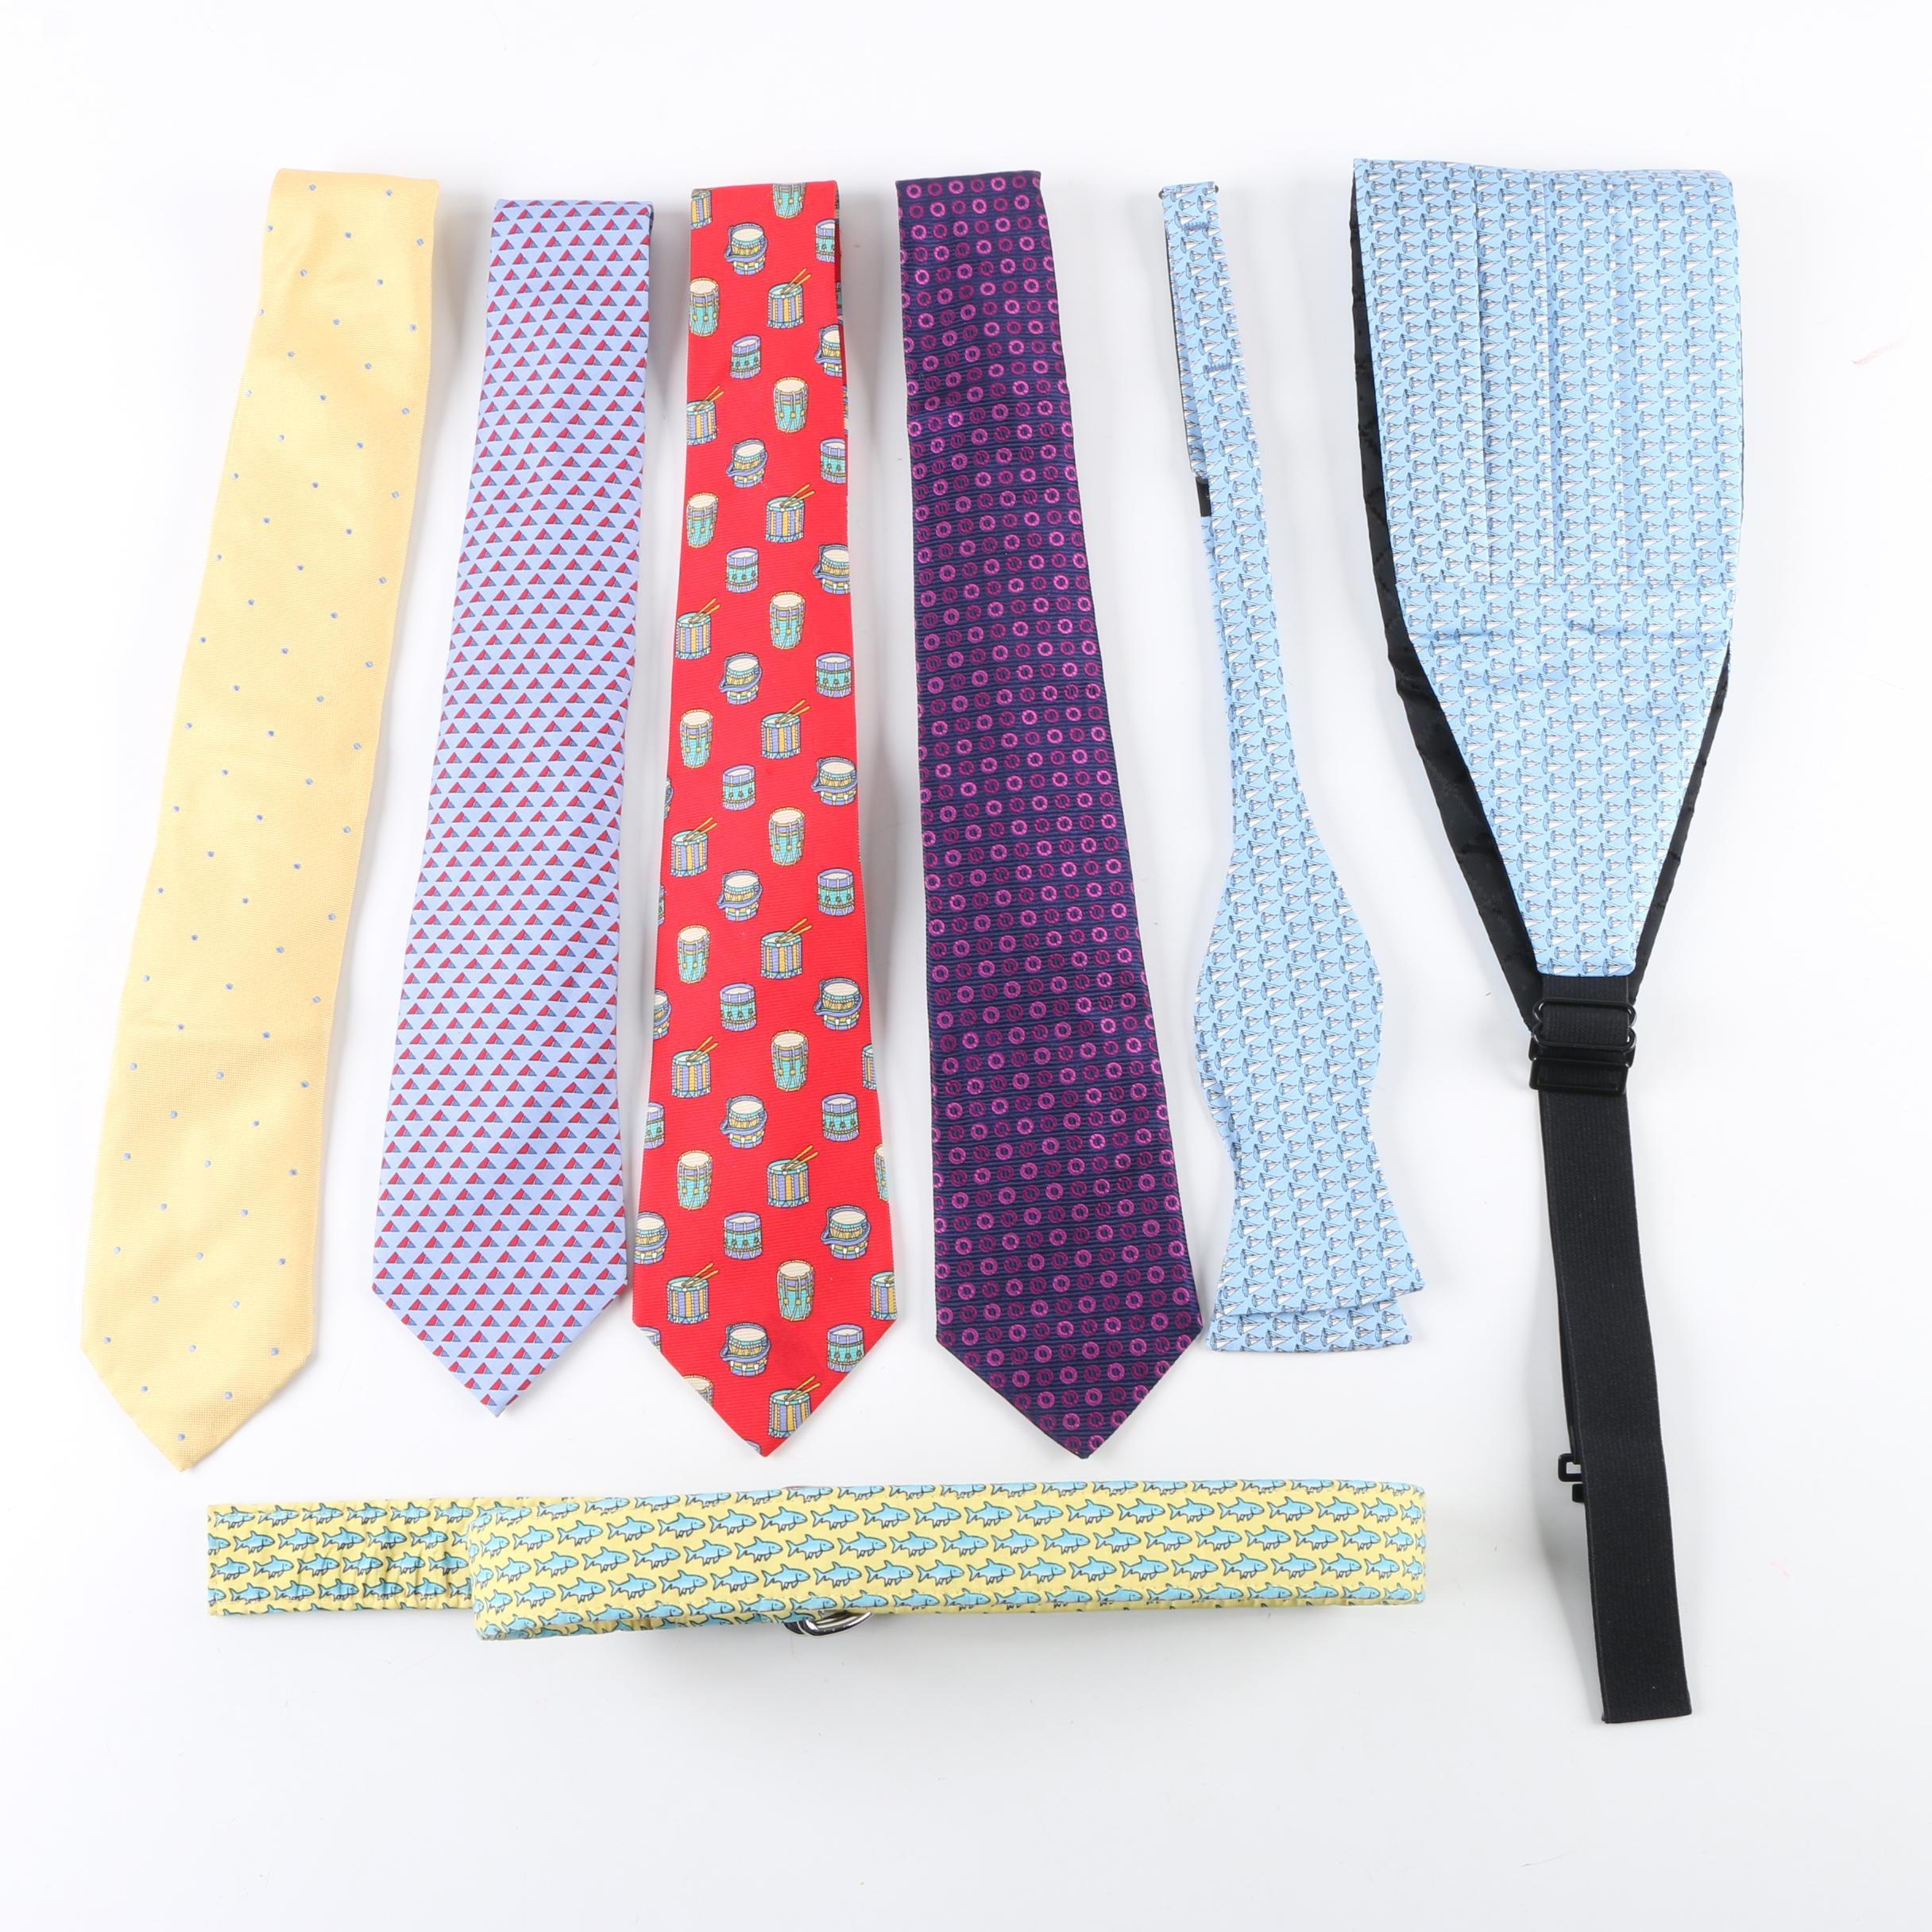 Neckties, Belt and Cummerbund Including Chanel and Vineyard Vines